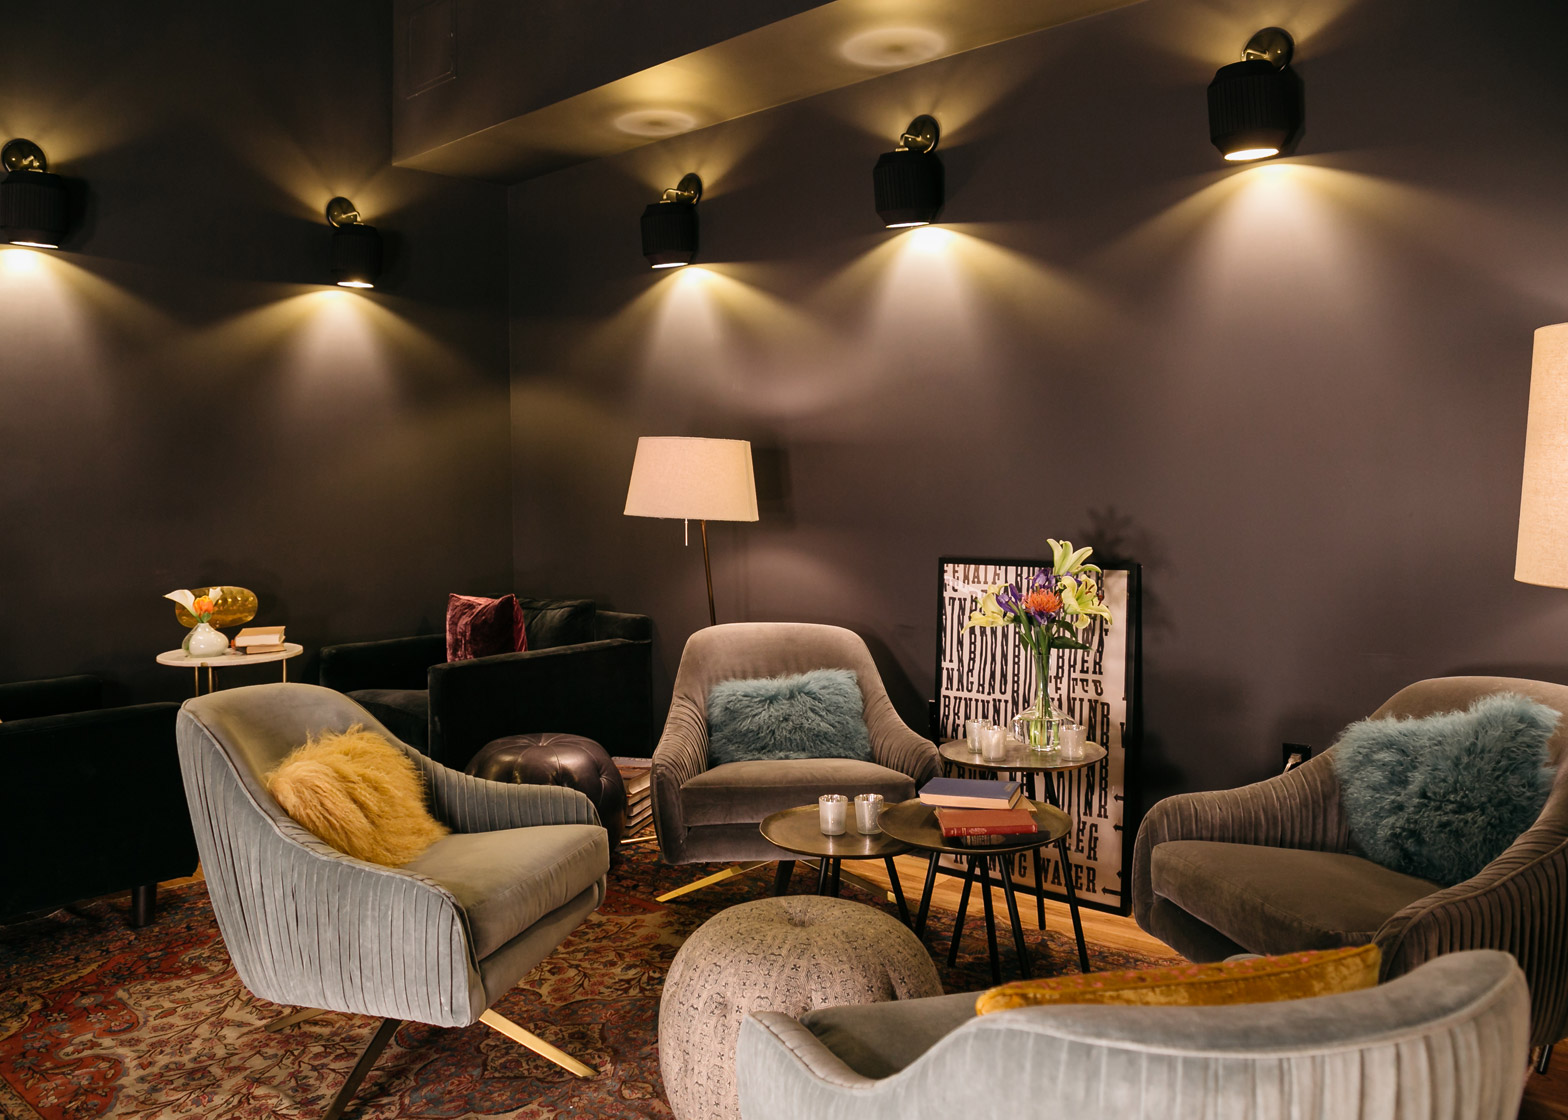 co-living-apartments-welive-new-york-city-usa_dezeen_1568_16.jpg